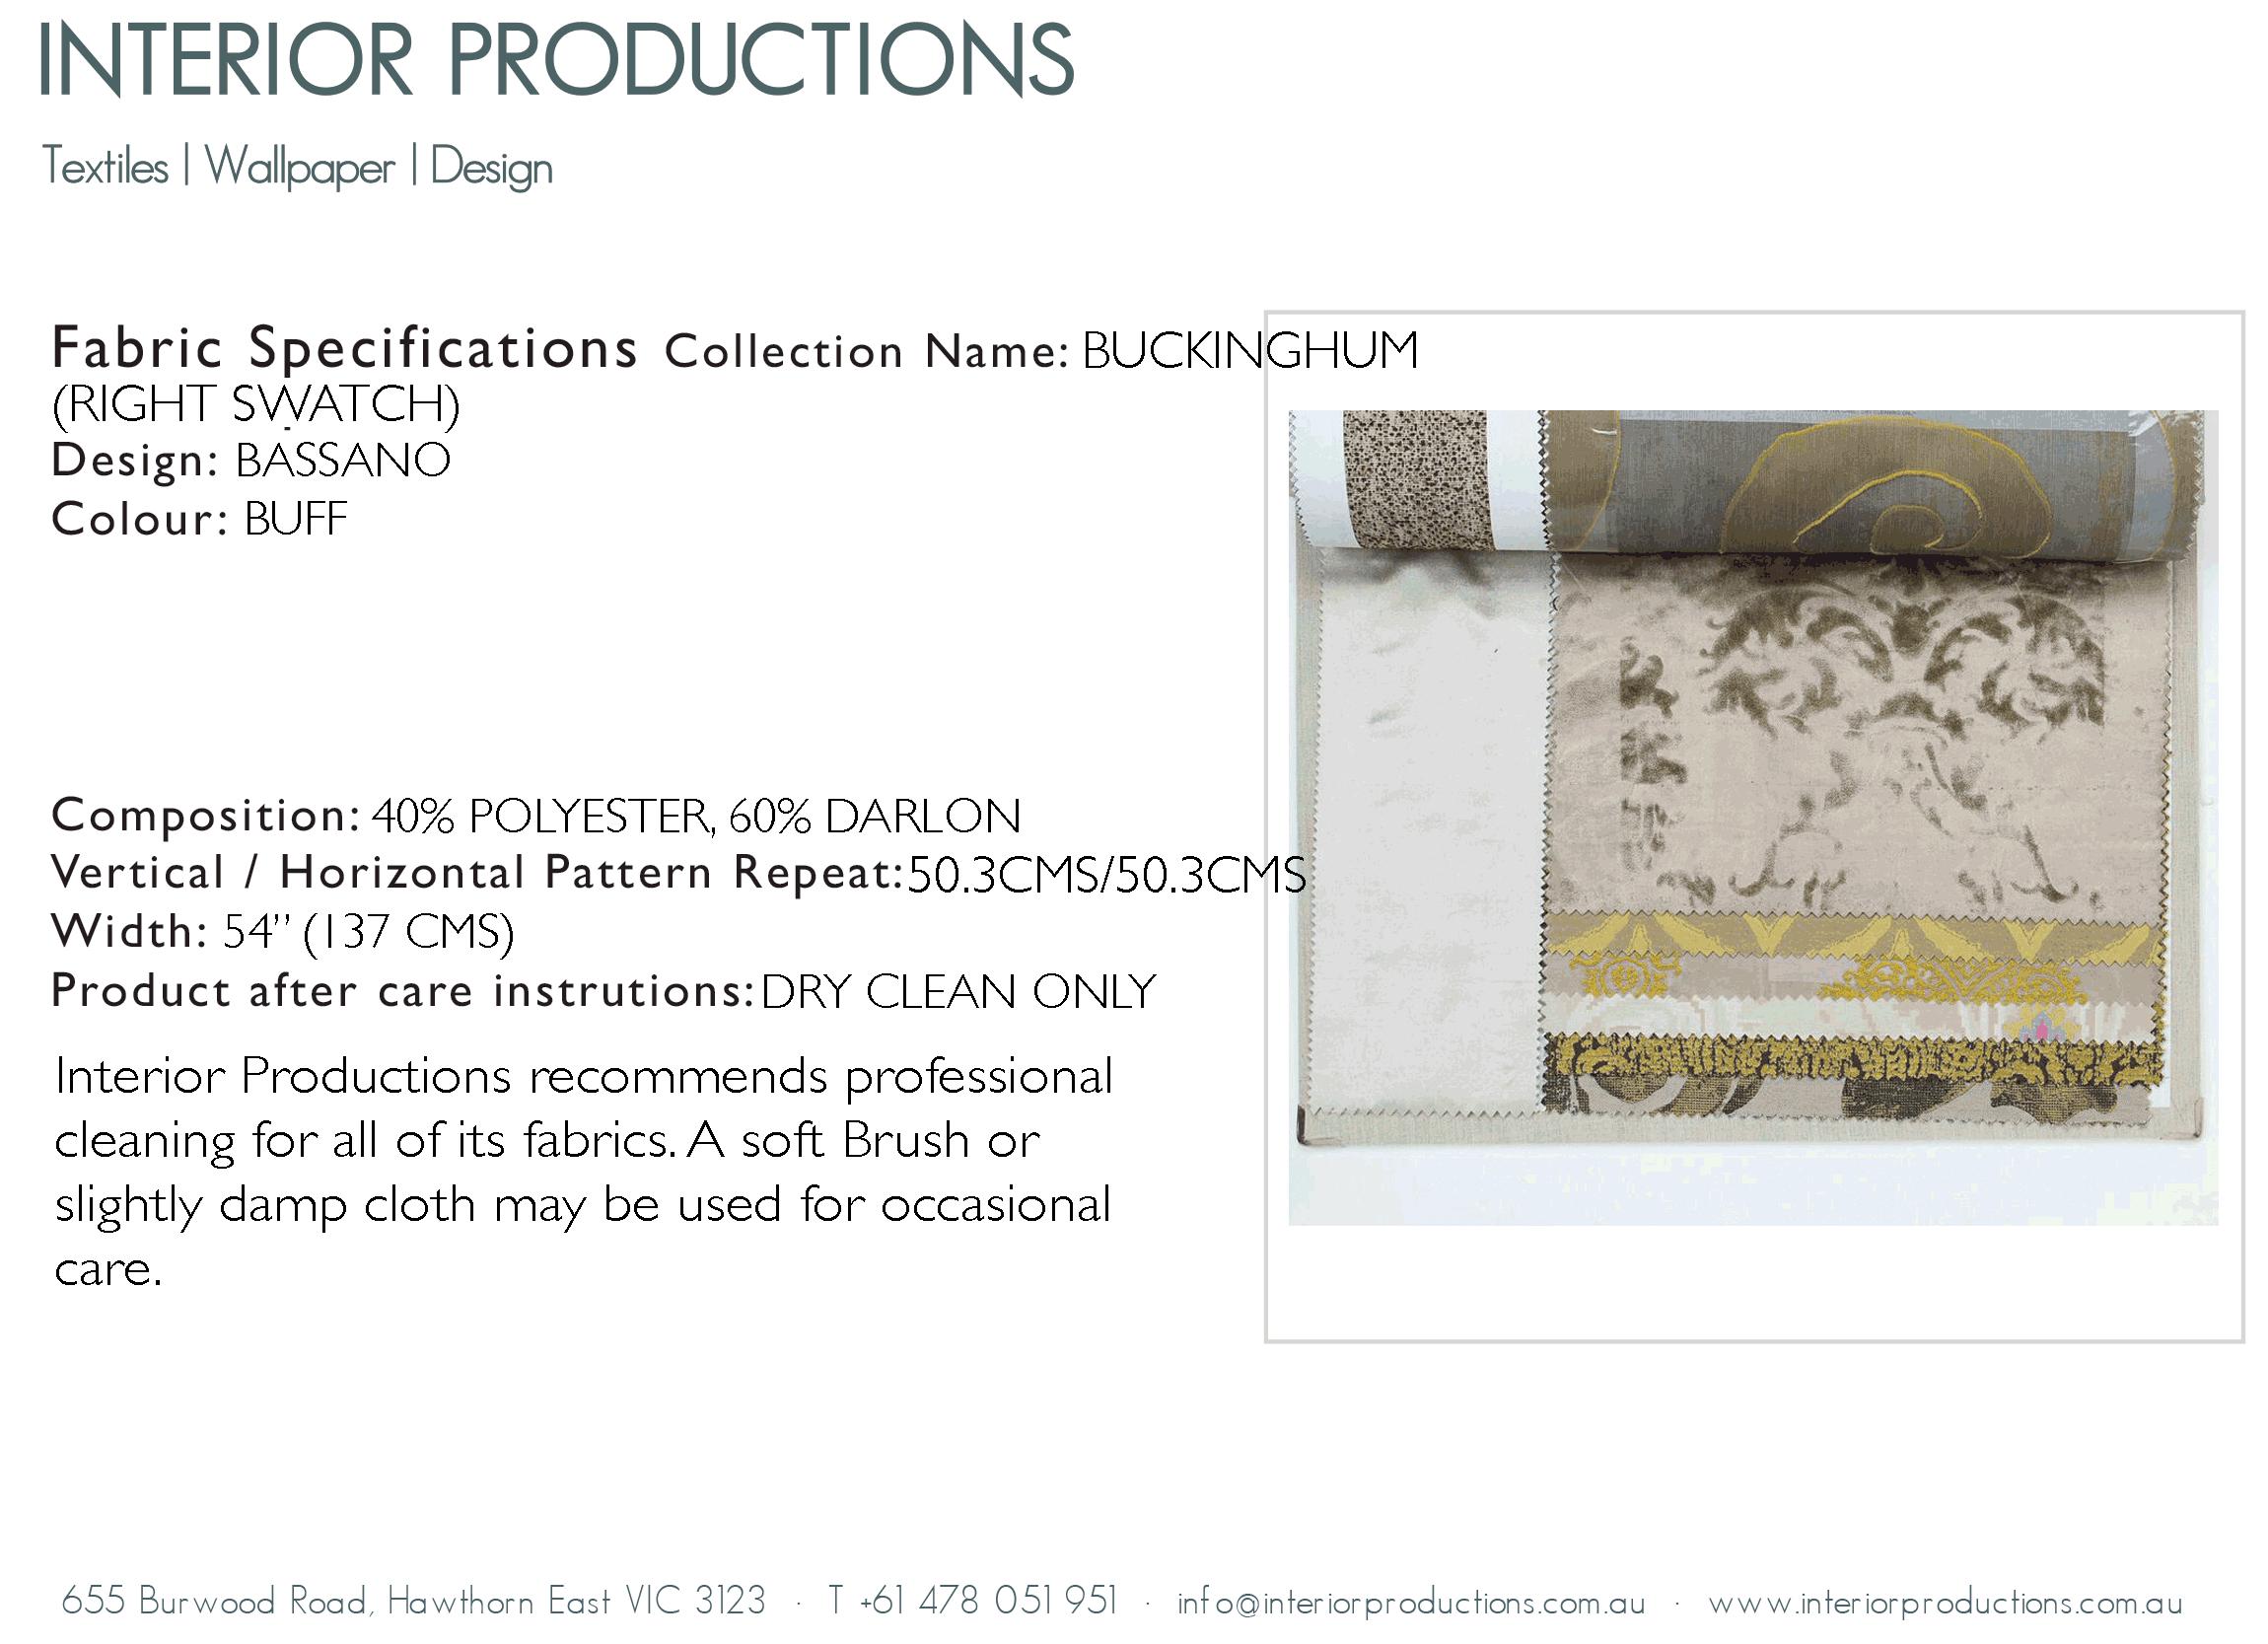 interior_productions_BASSANO---BUFF